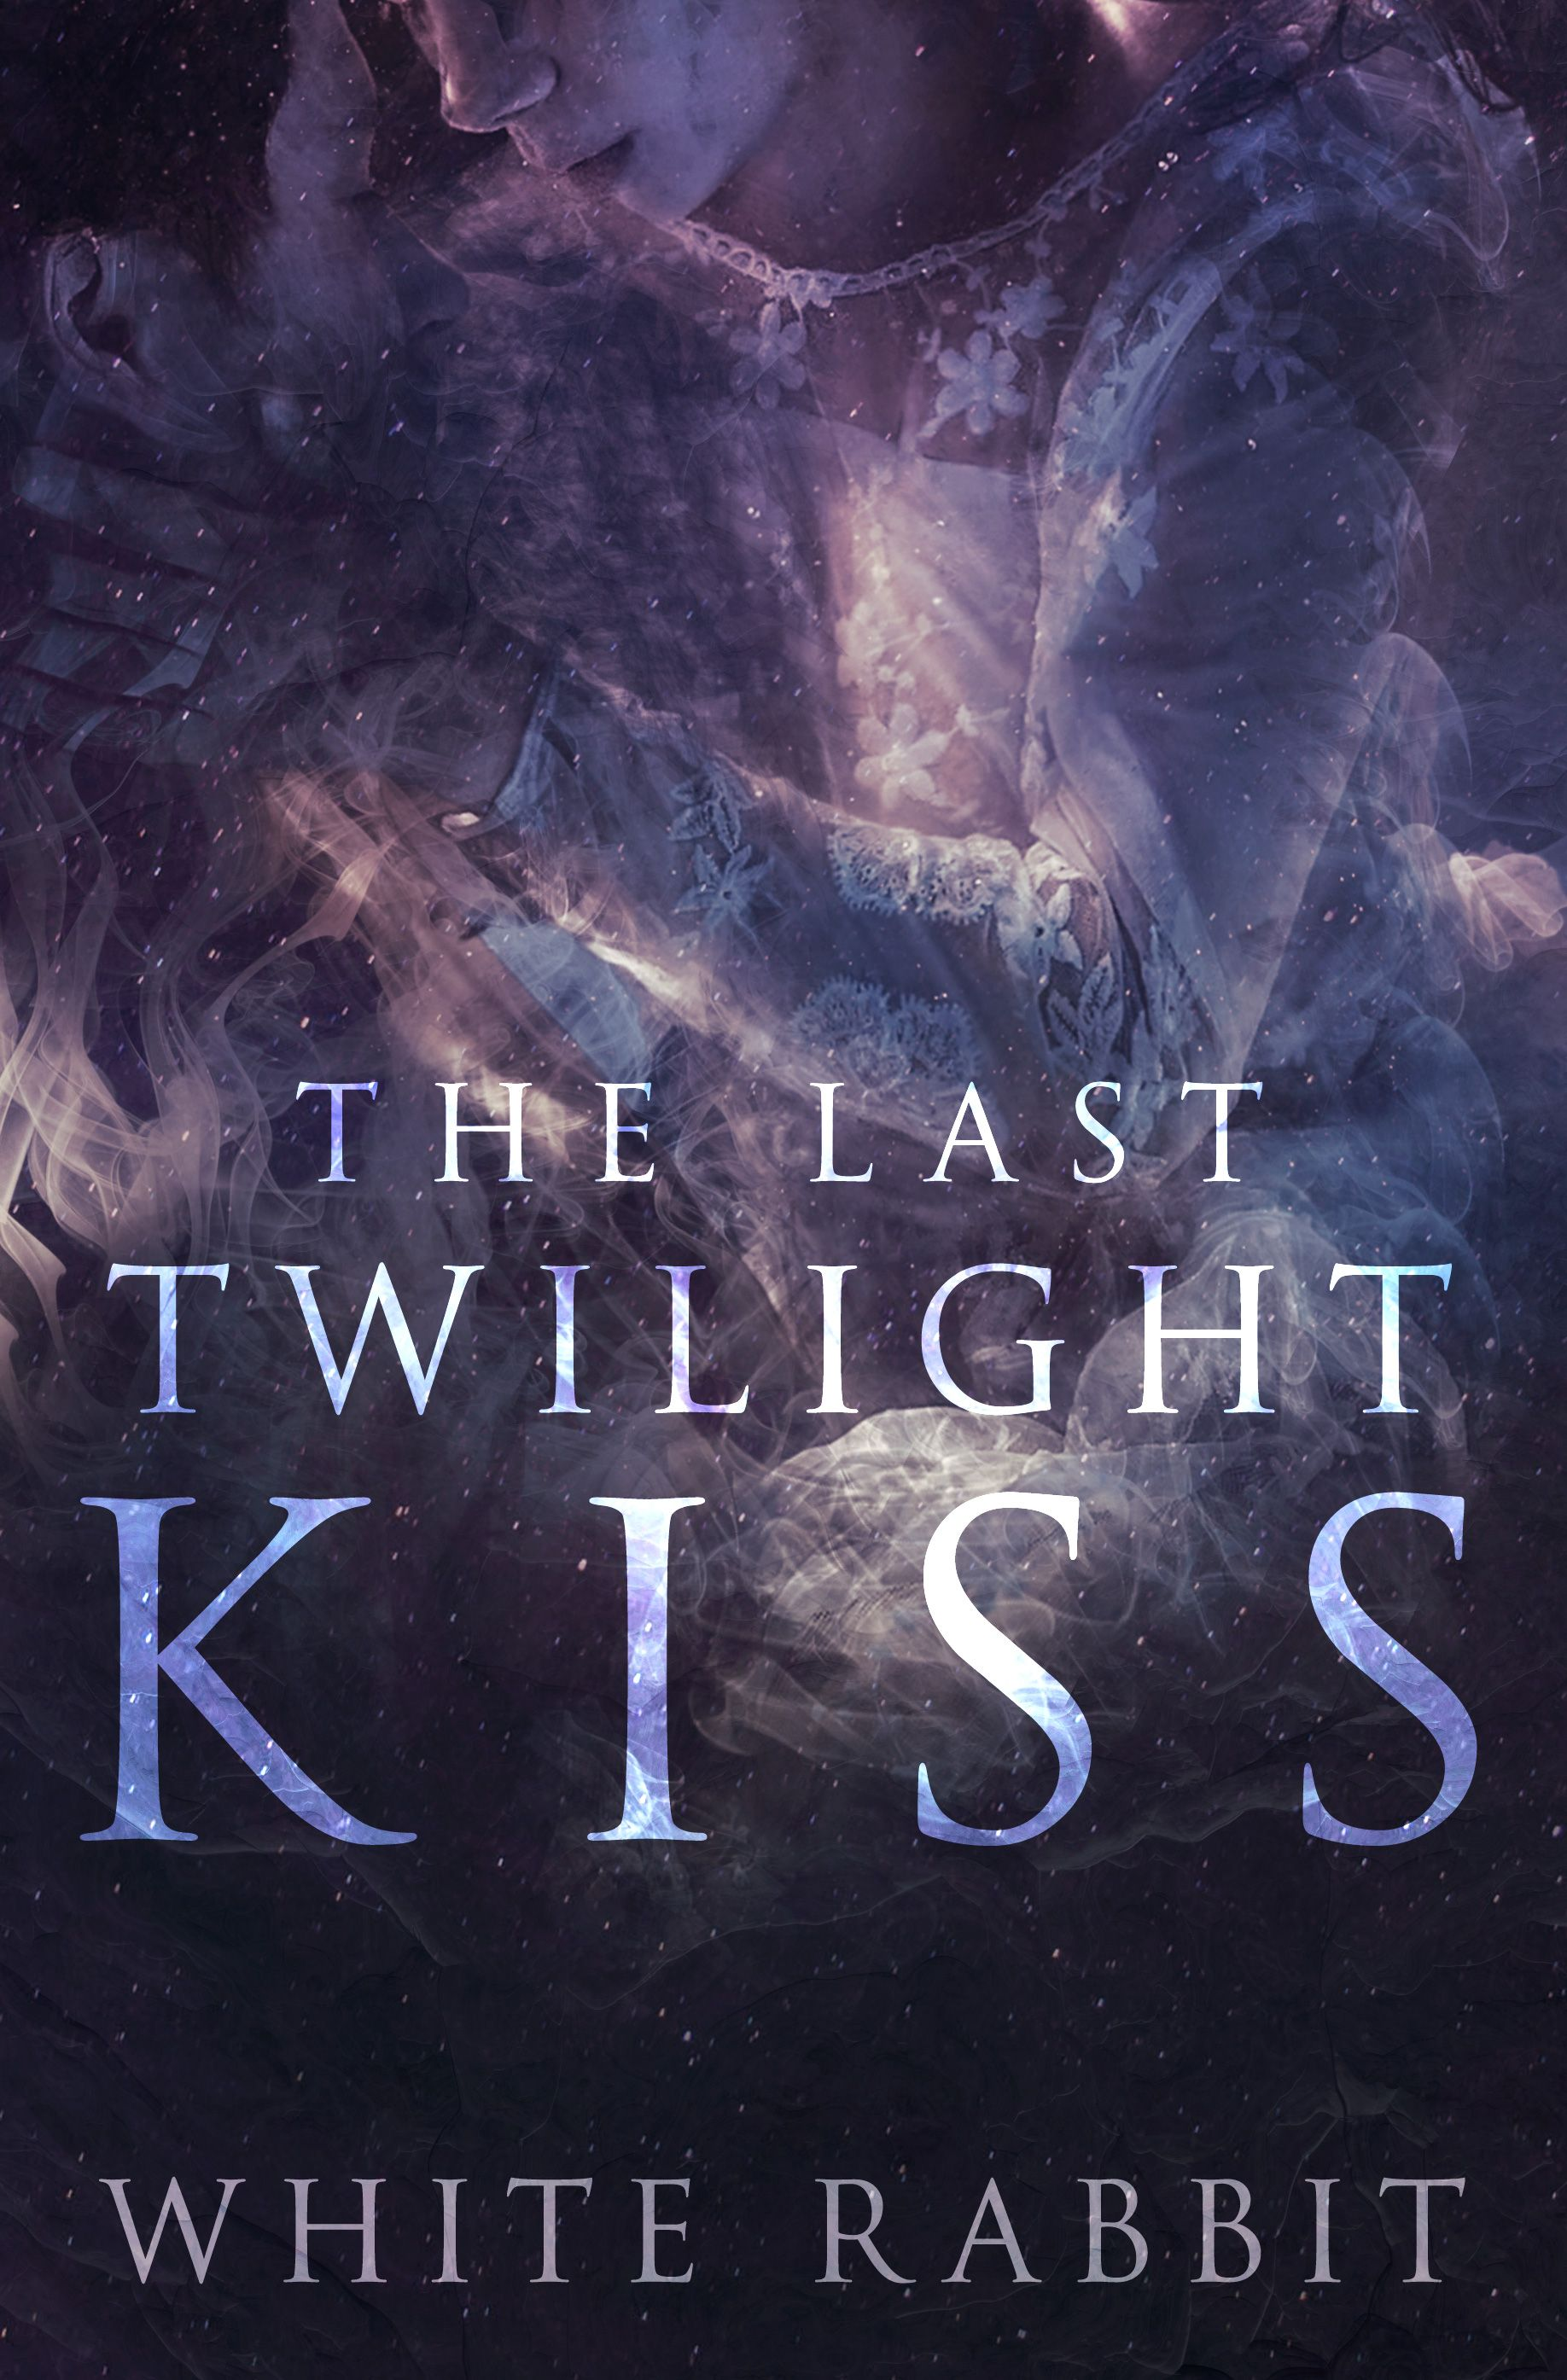 The Last Twilight Kiss